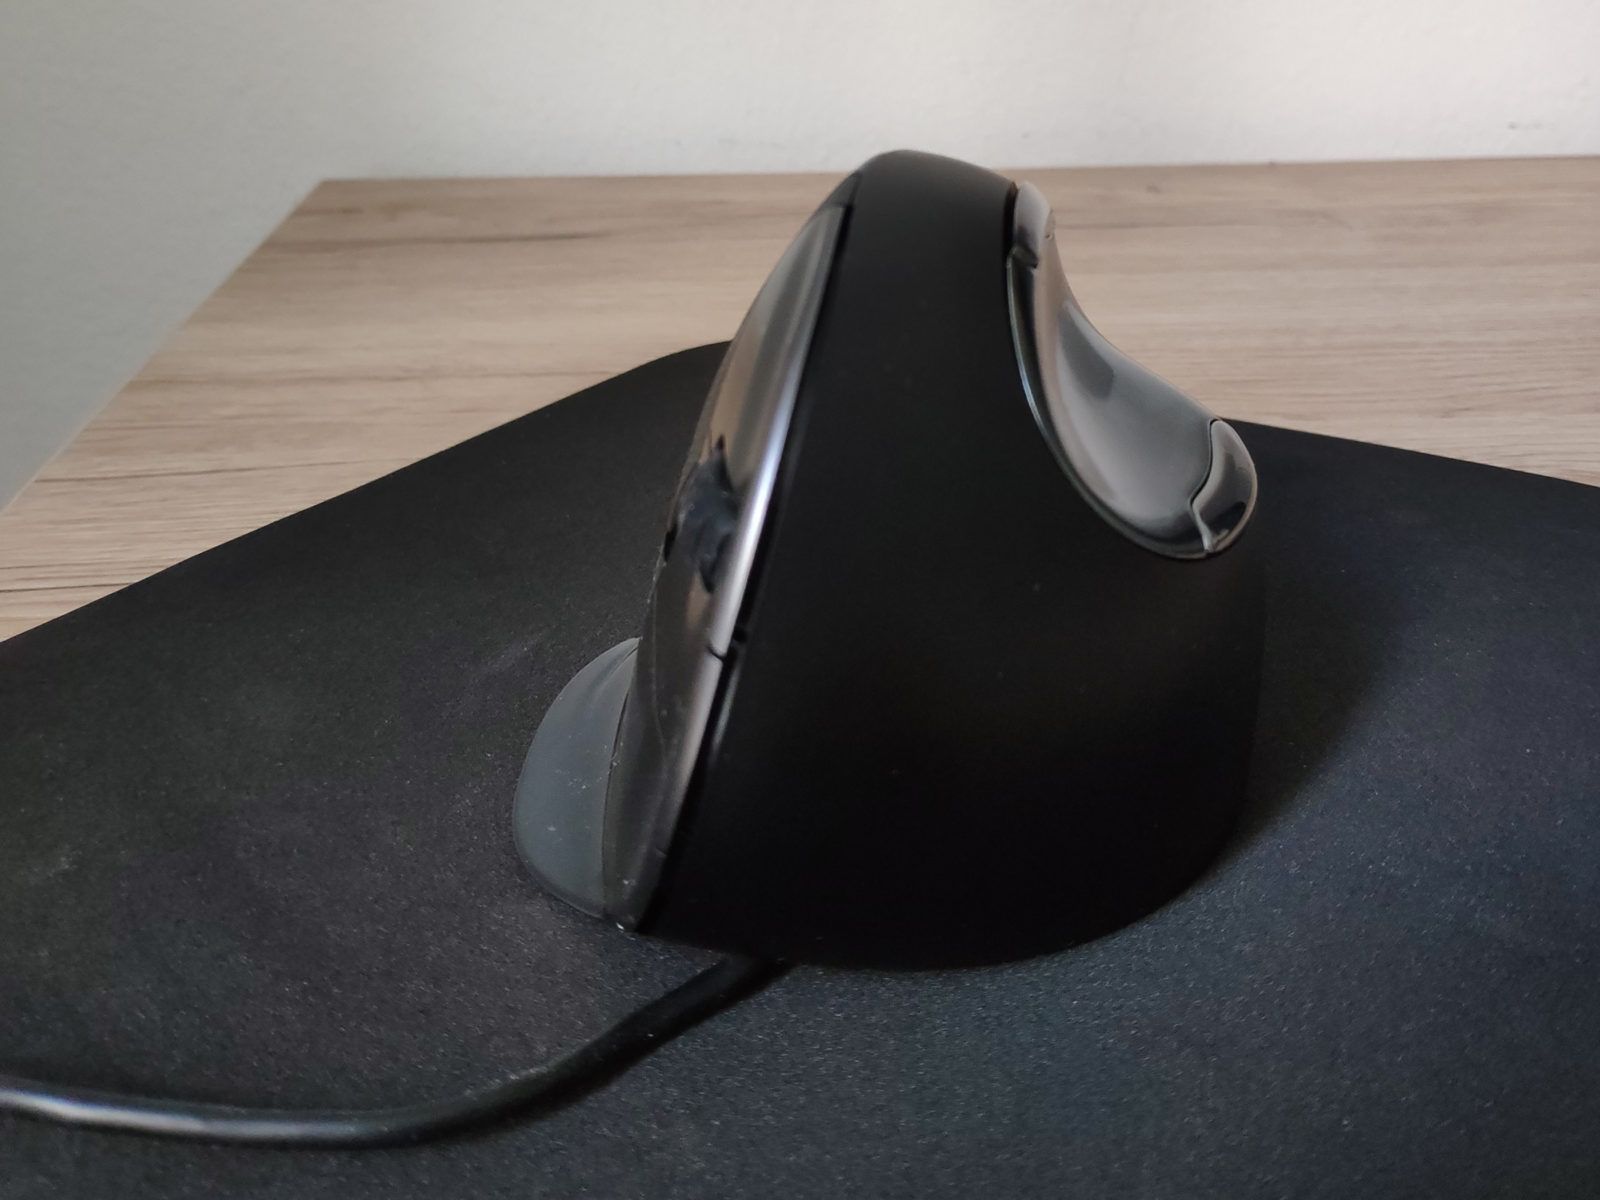 Evoluent Vertical Mouse D Test beim Arbeiten 2